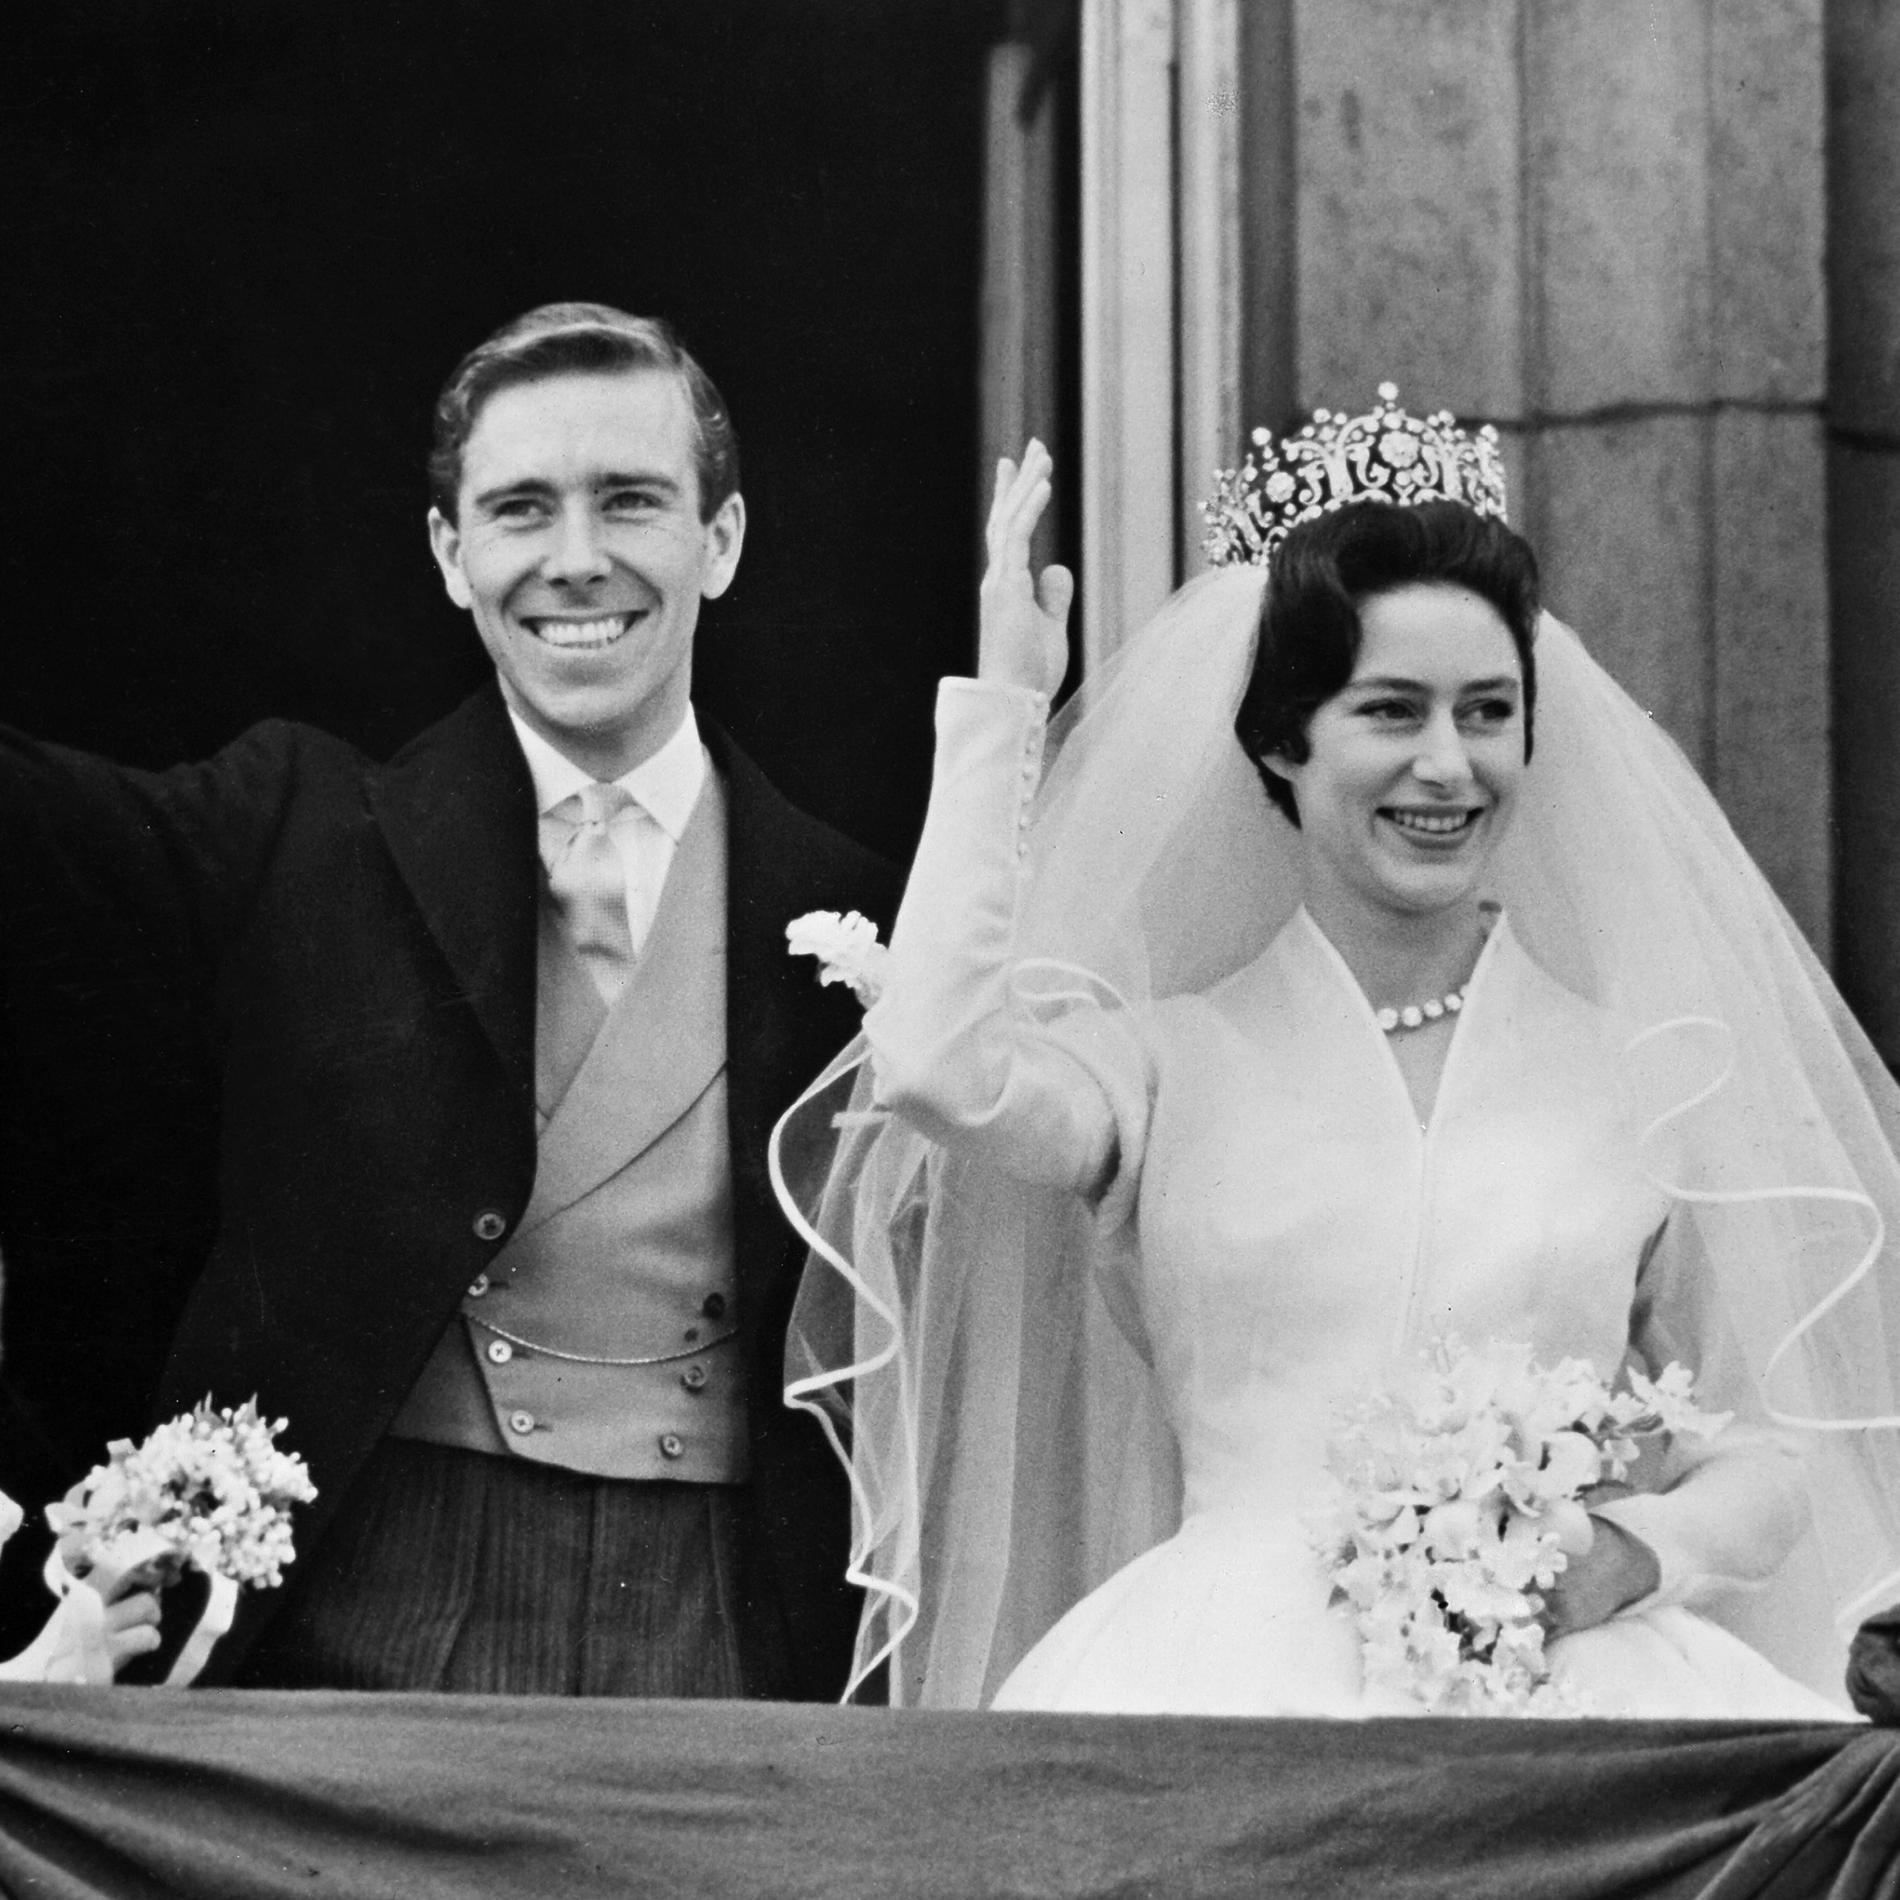 Le mariage de la princesse Margaret